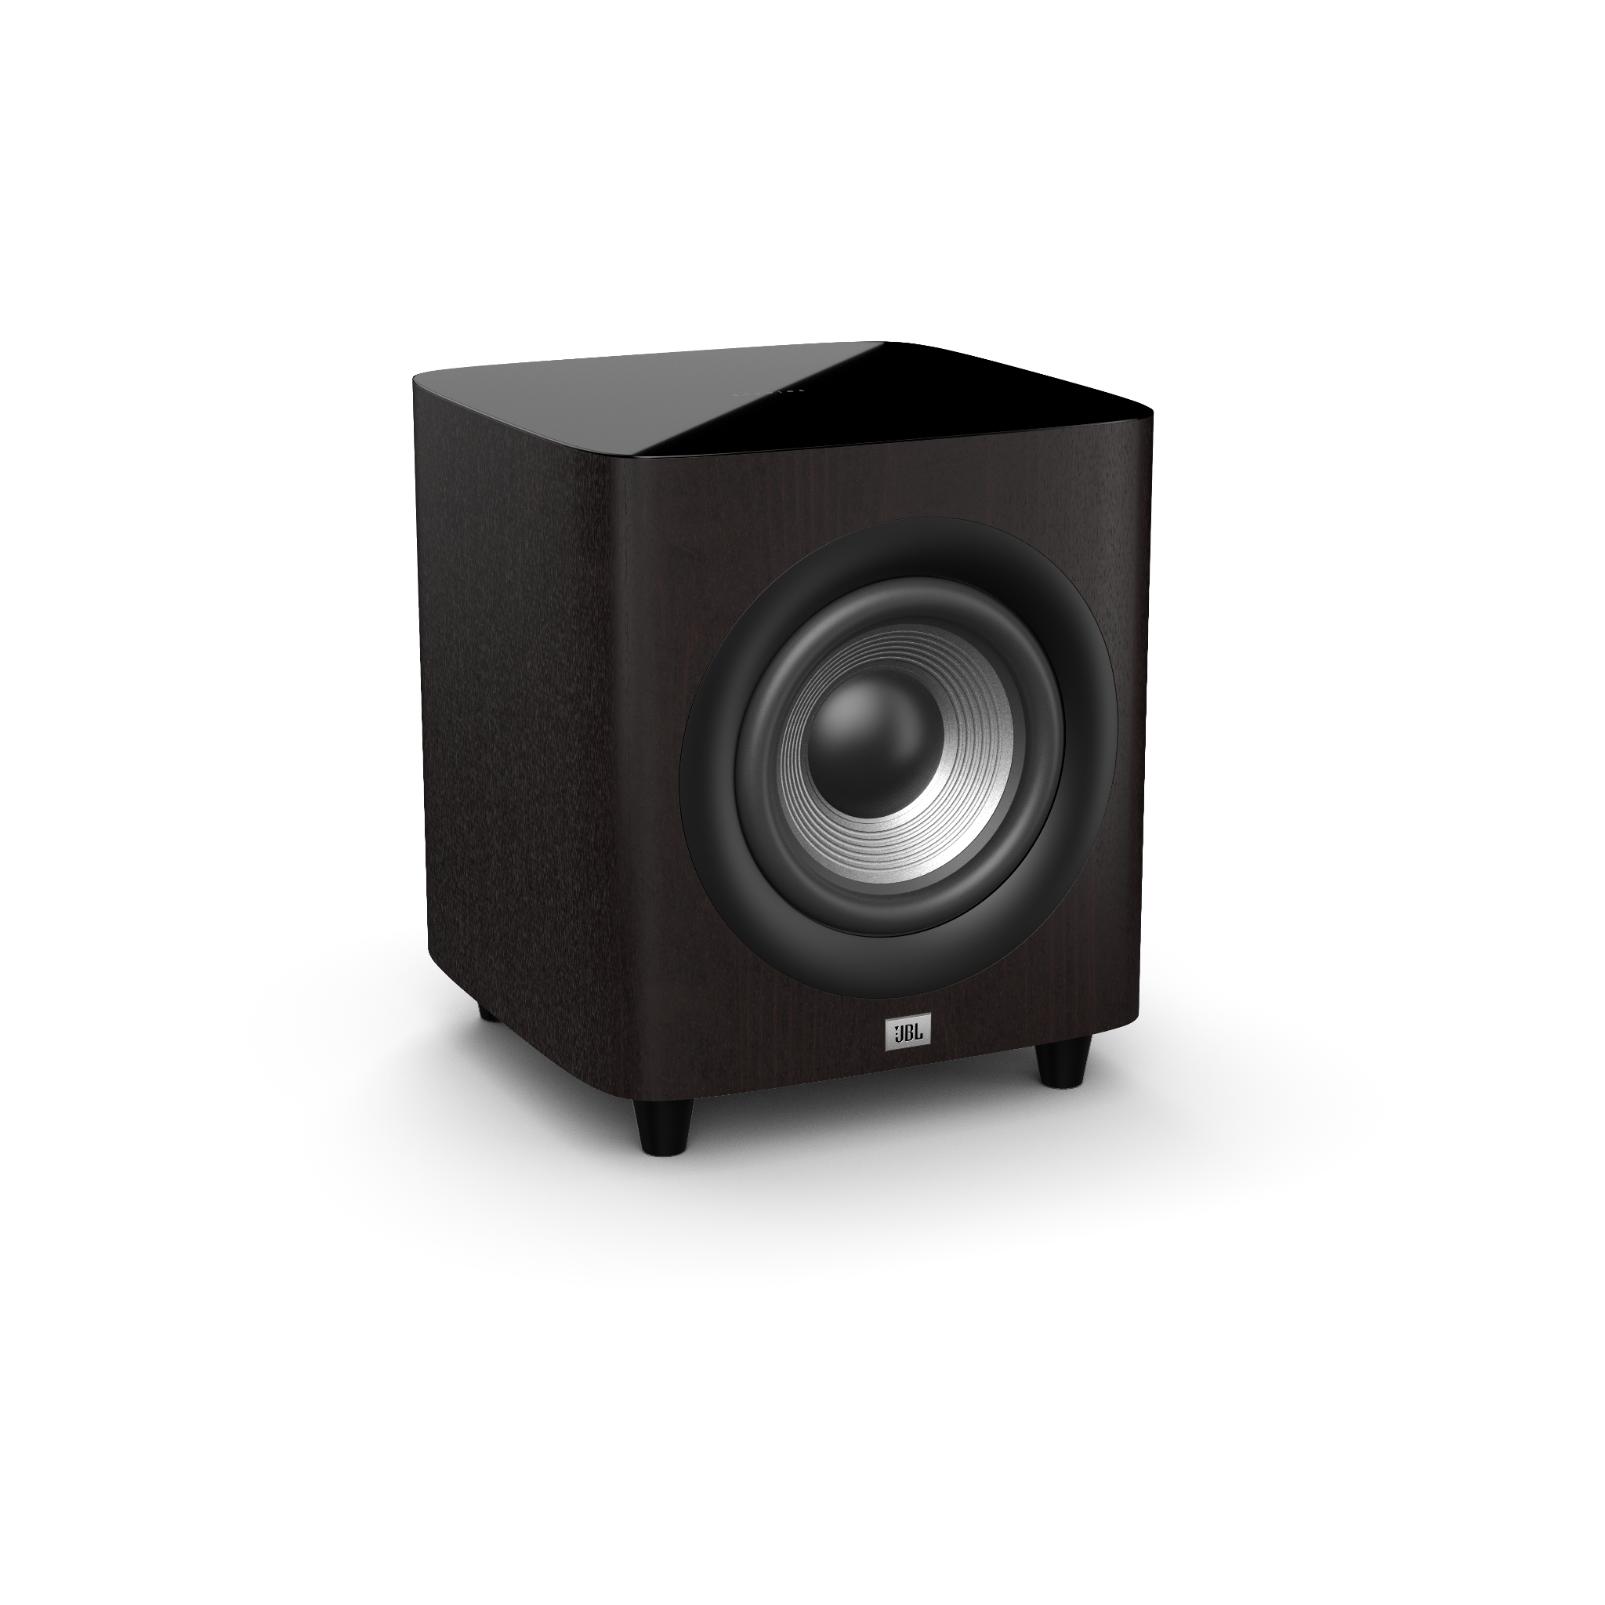 JBL STUDIO 650P - Dark Wood - Home Audio Loudspeaker System - Hero